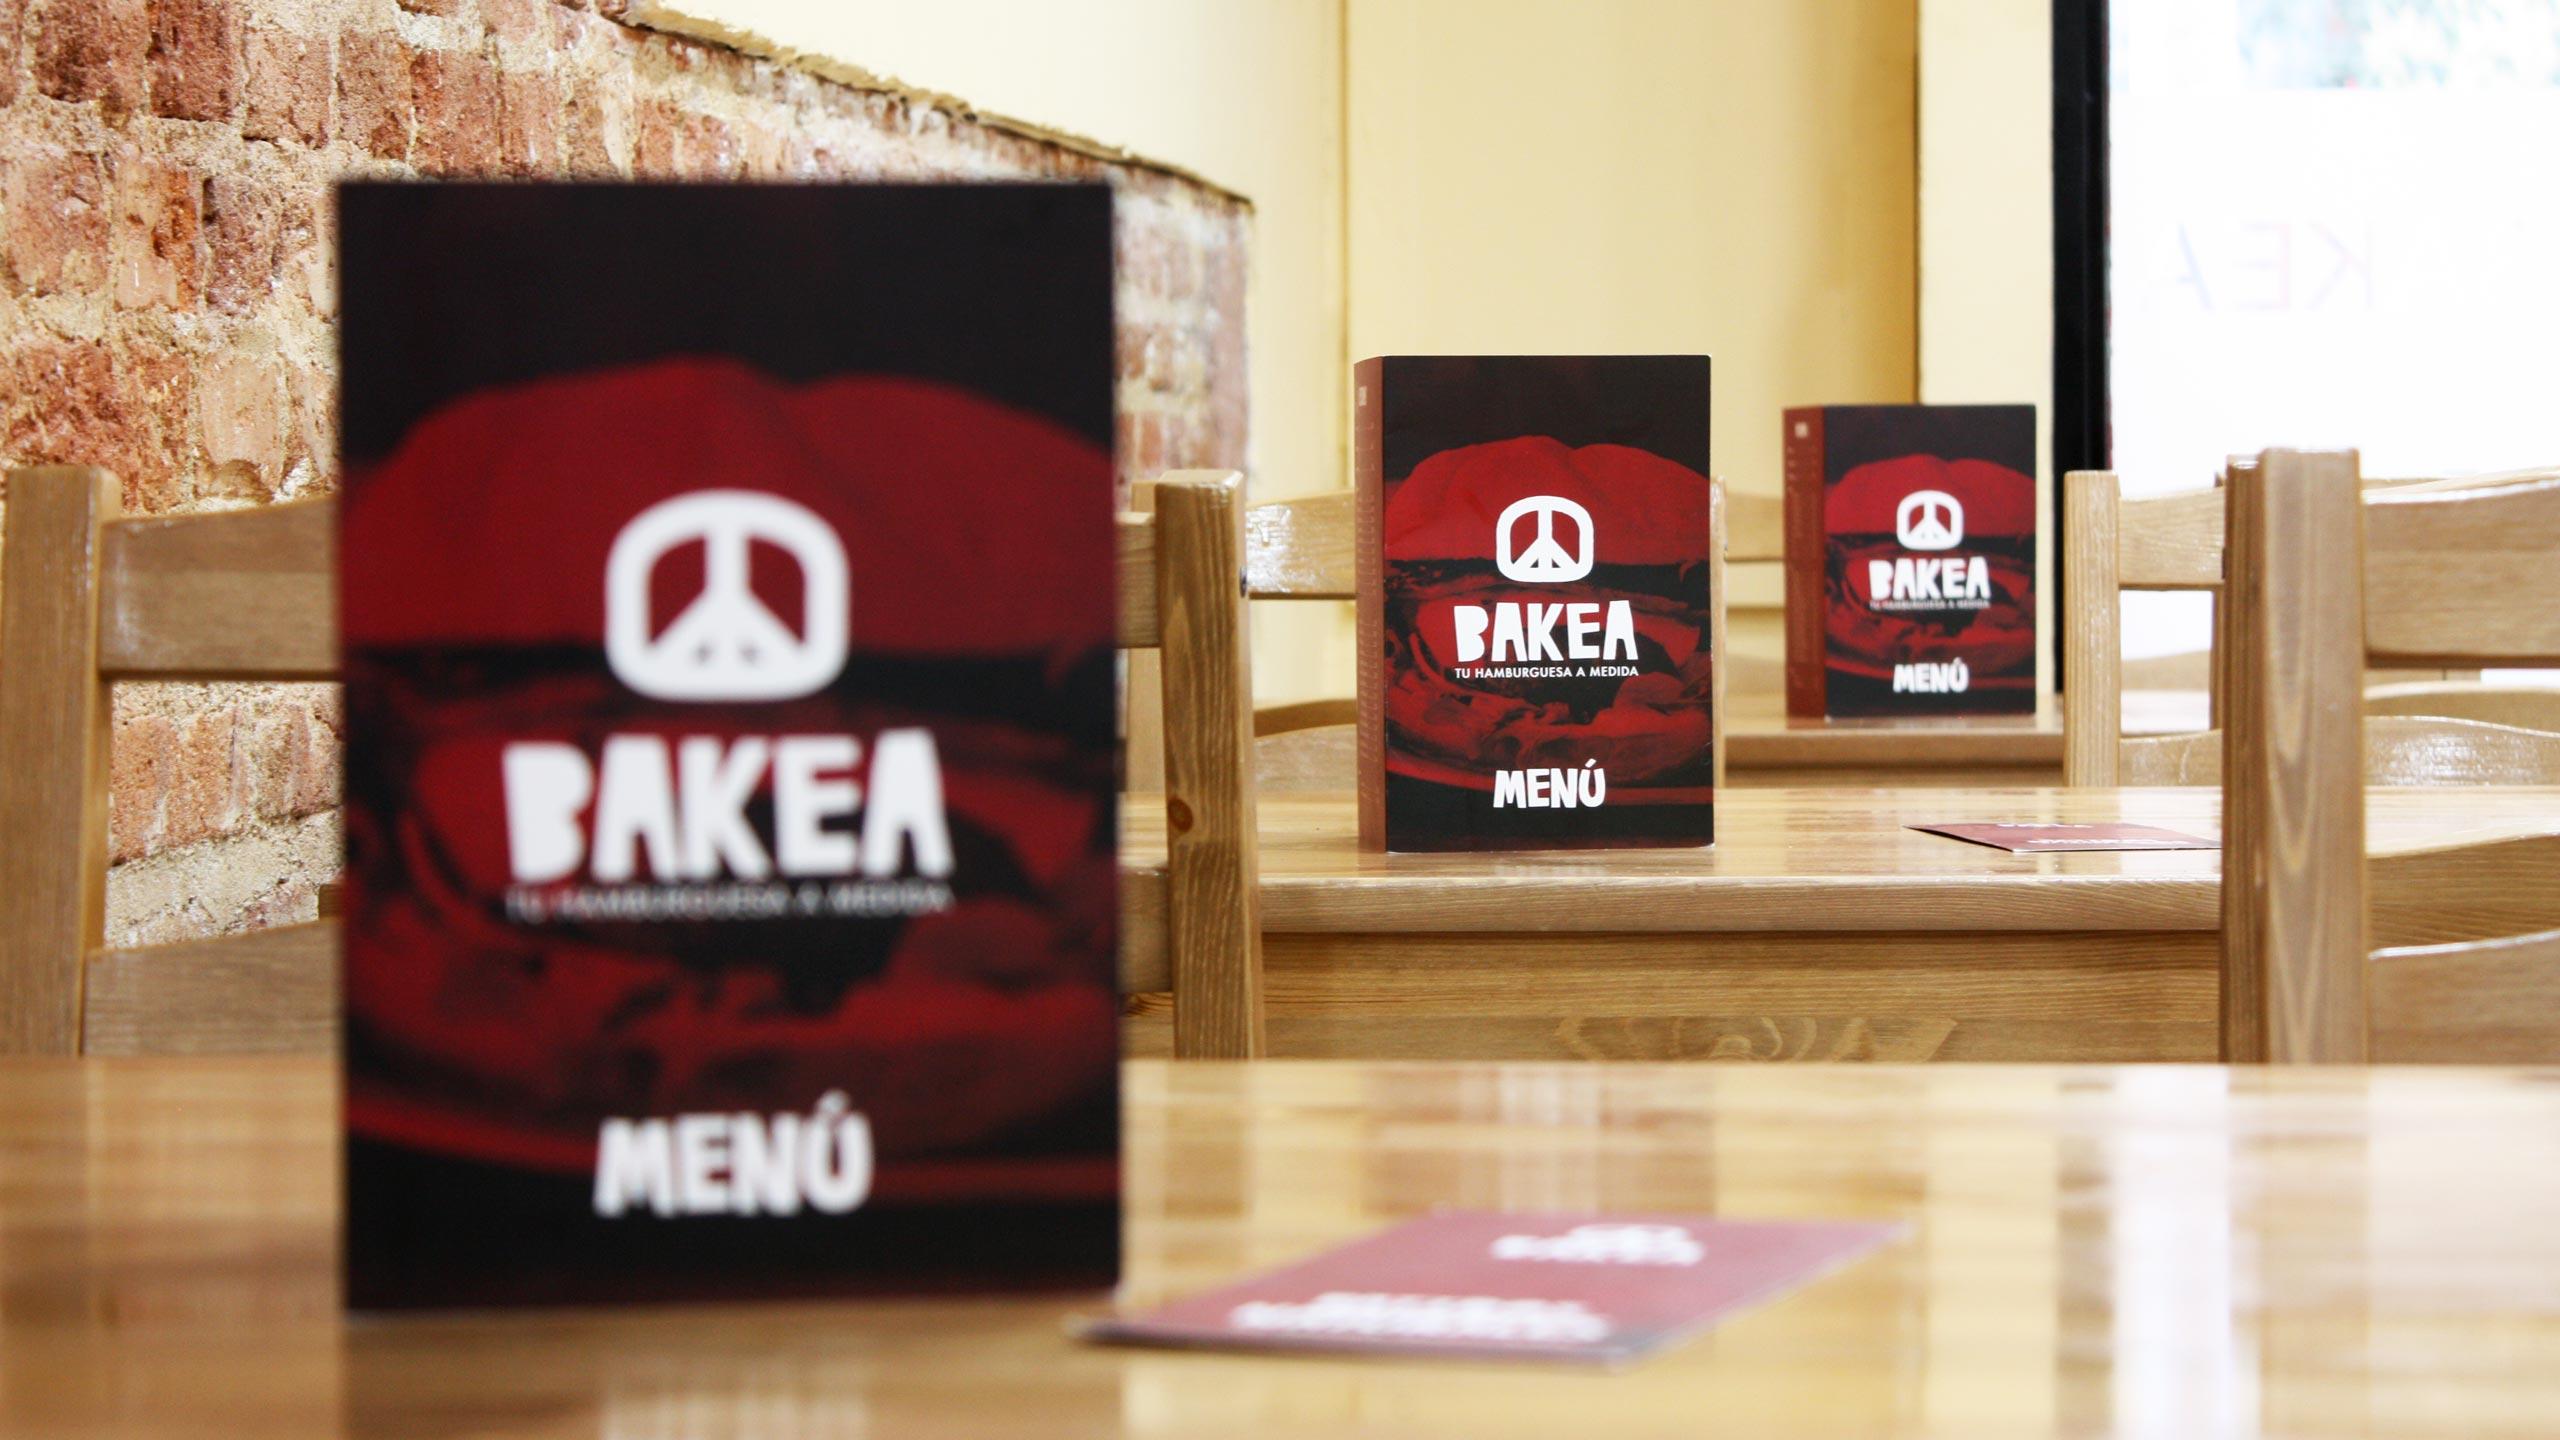 kamikaze_identidad_bakea_11